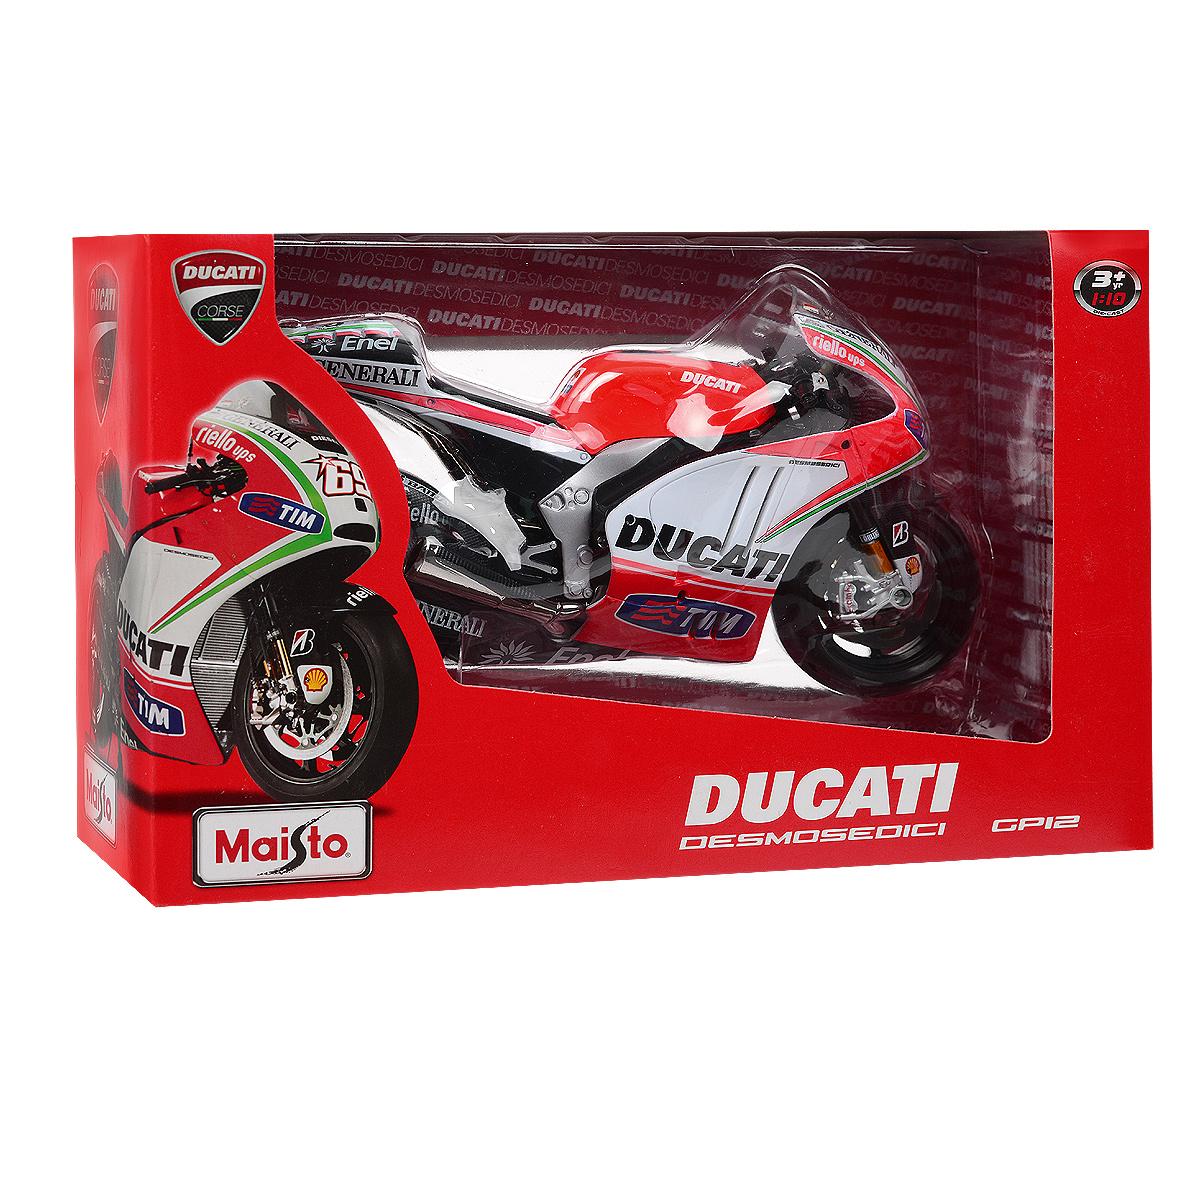 Maisto Модель мотоцикла Ducati Demosedici 2012